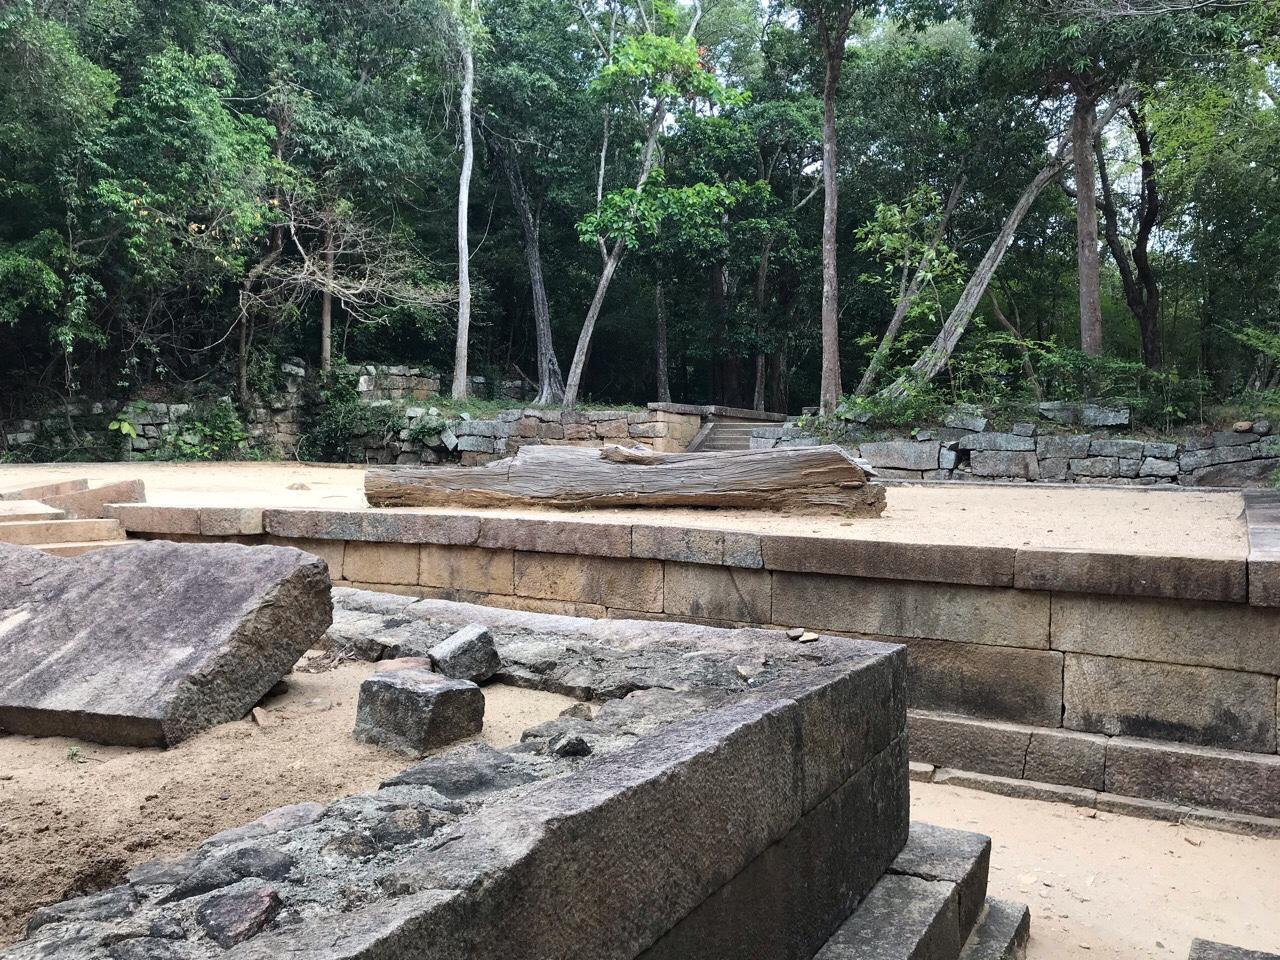 Sri Lanka Jasmine Tours & Drivers スリランカジャスミンツアーズ撮影。リティガラ遺跡の沐浴場跡